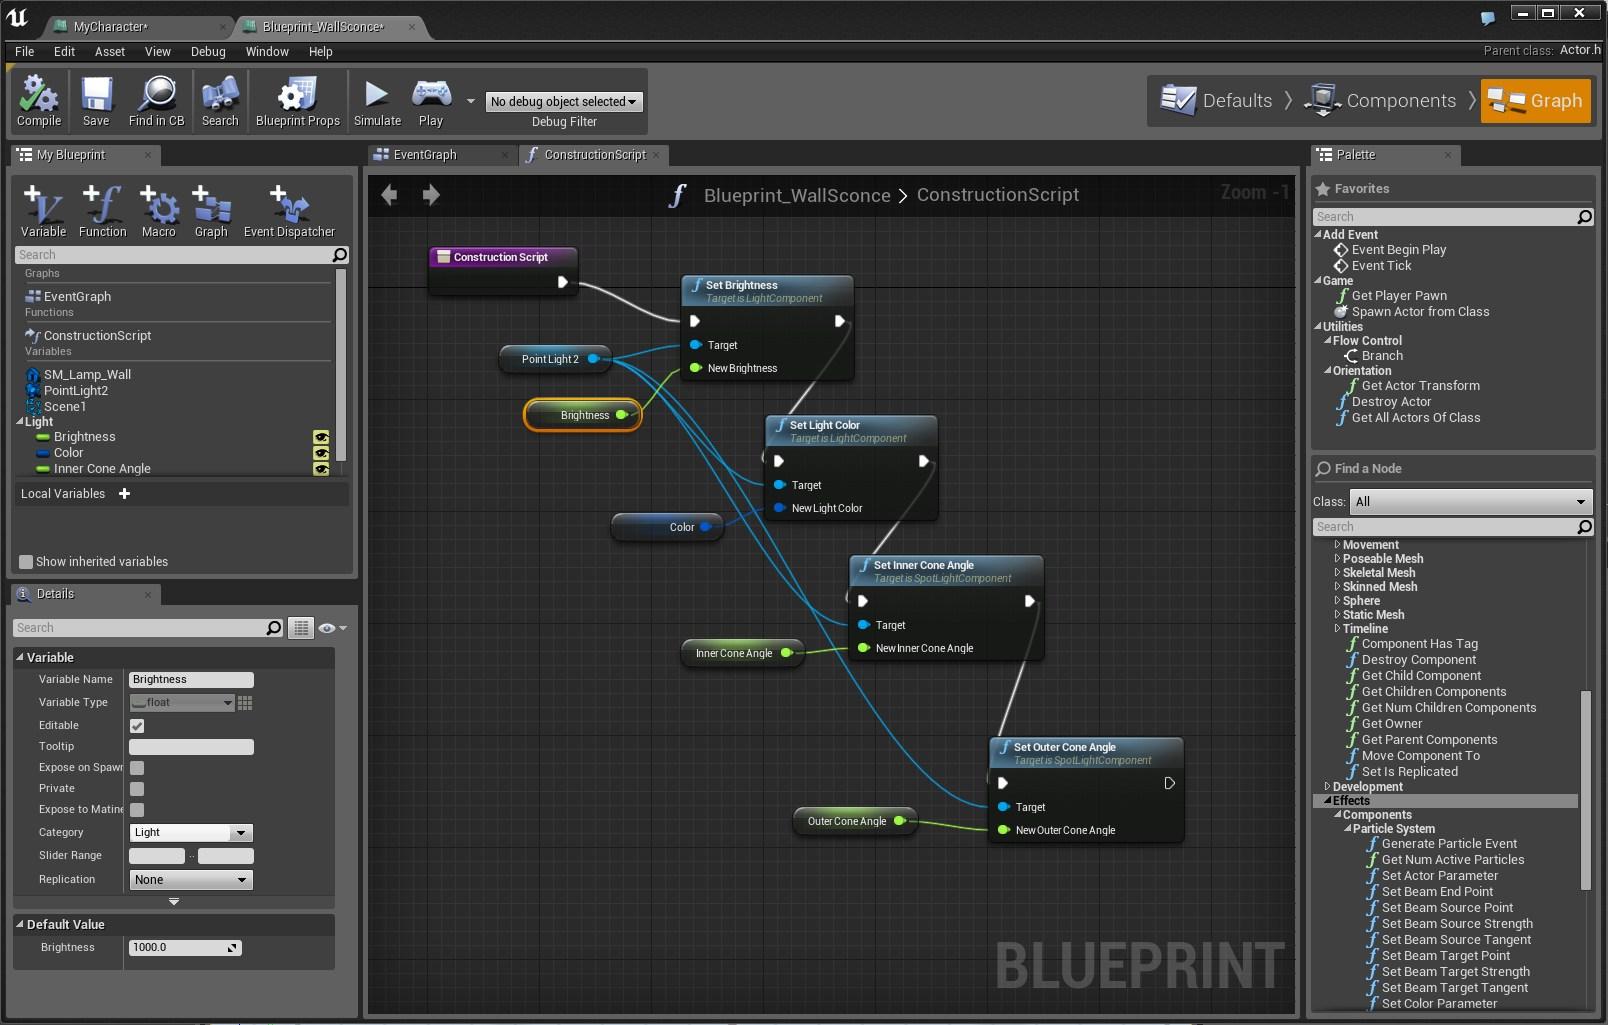 Blueprint editor image unreal engine 4 games mod db add media report rss blueprint editor view original malvernweather Image collections